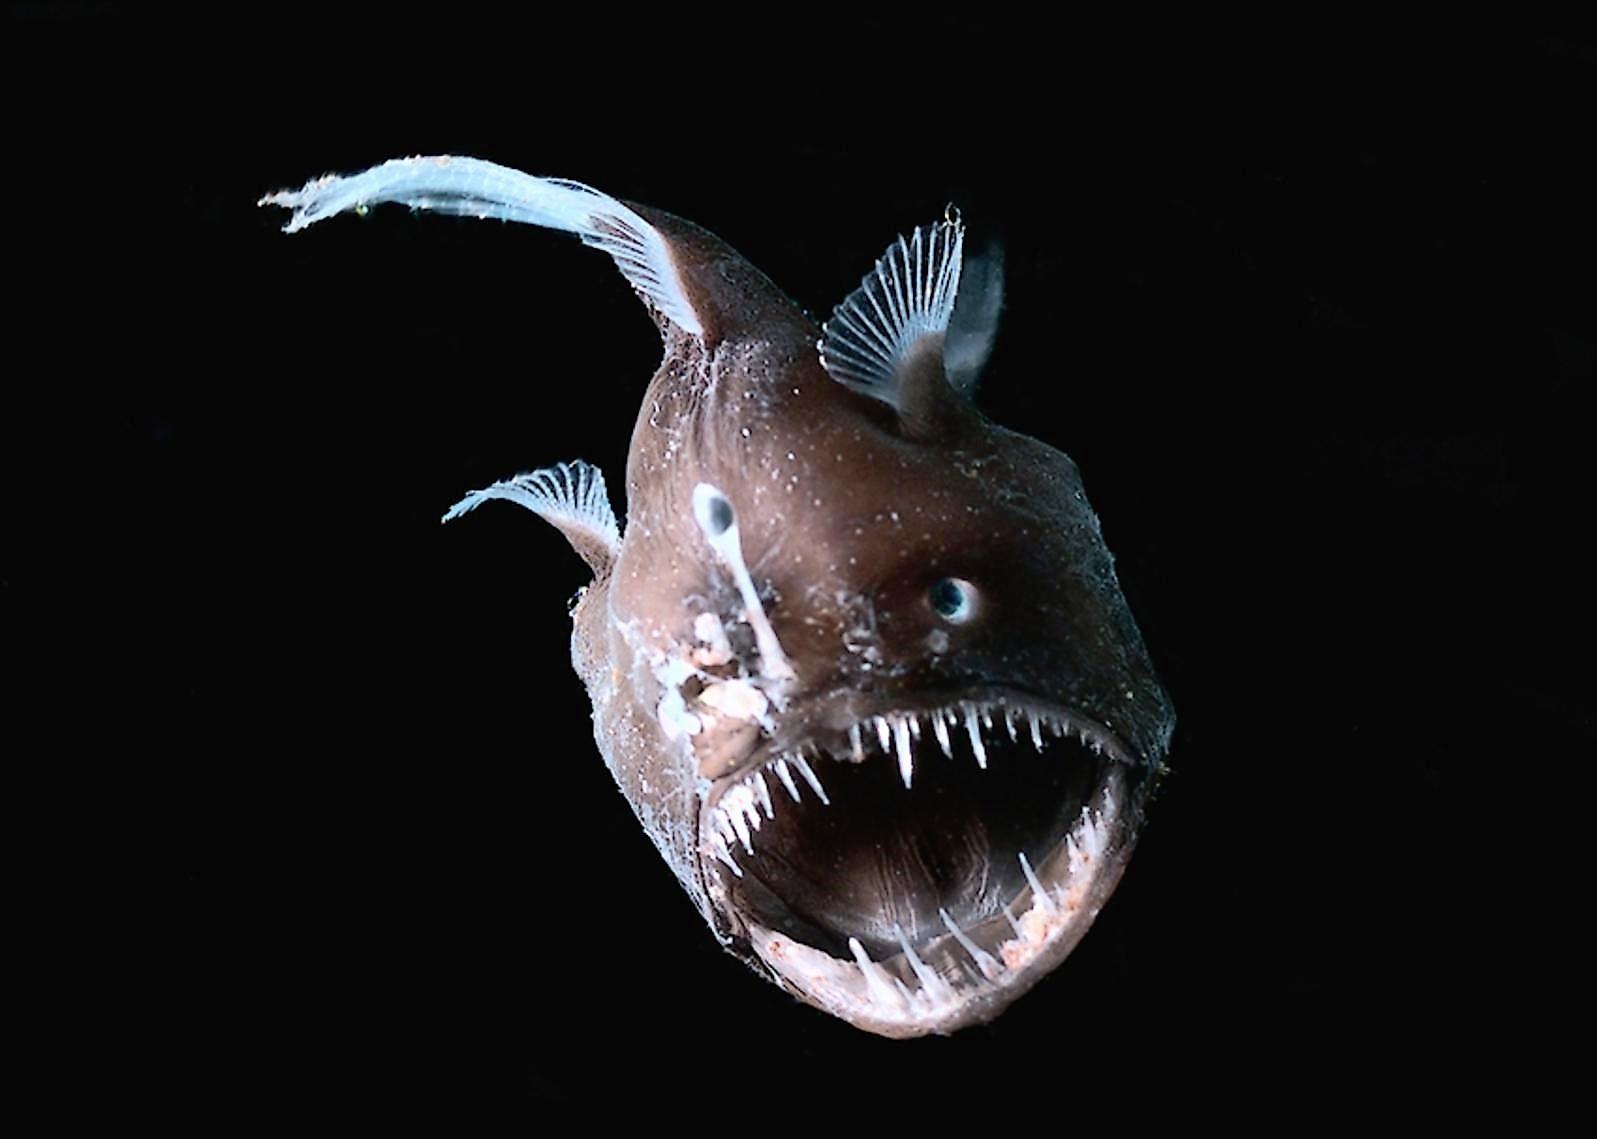 Il diavolo nero degli abissi - Deep-sea anglerfish - Melanocetus